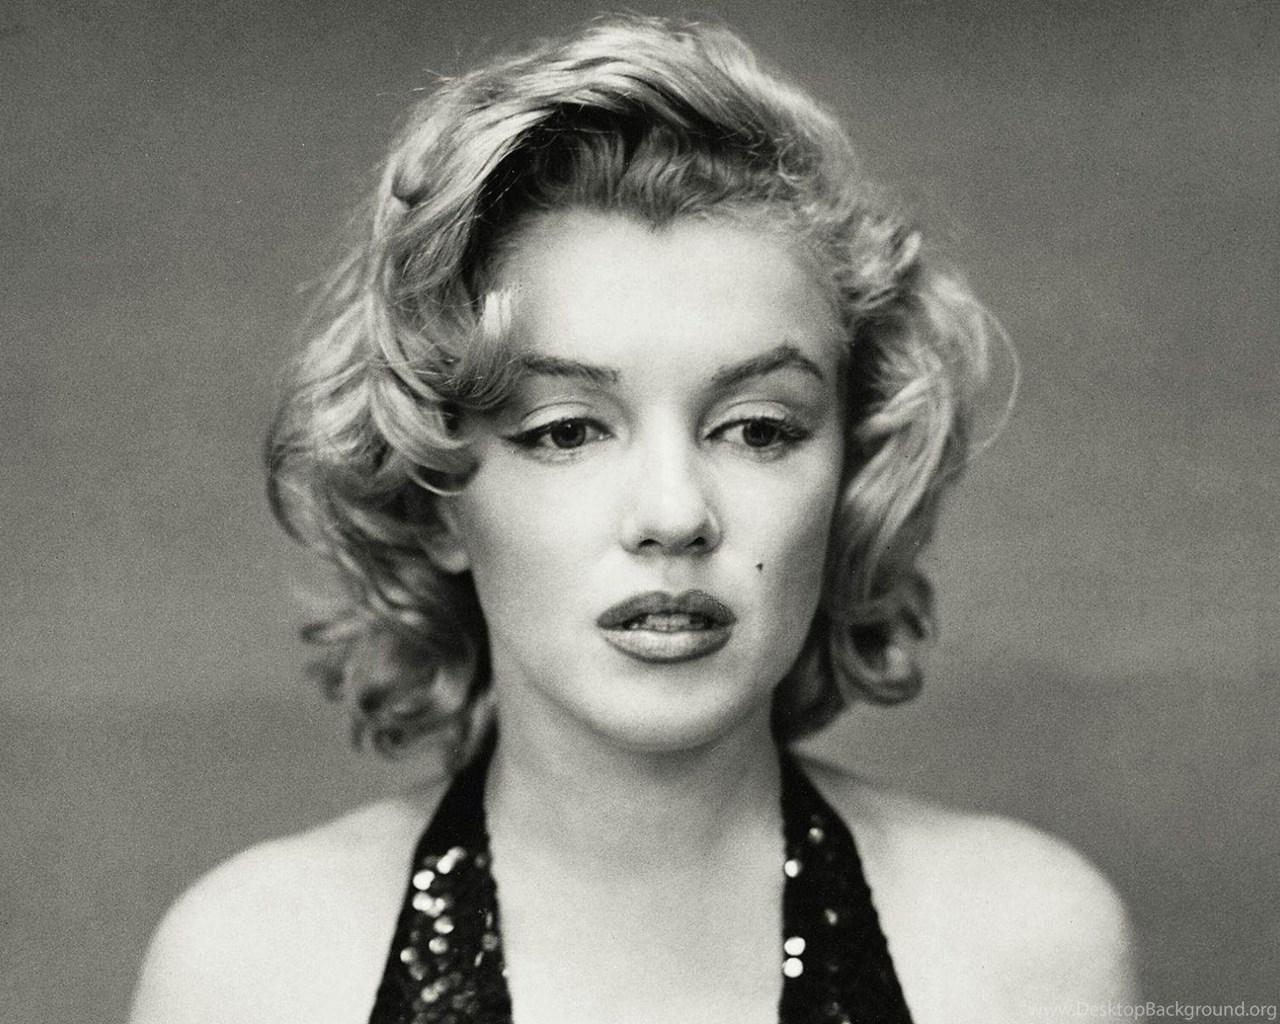 Marilyn monroe poster backgrounds hd wallpaper get it now desktop background - Marilyn monroe wallpaper download ...